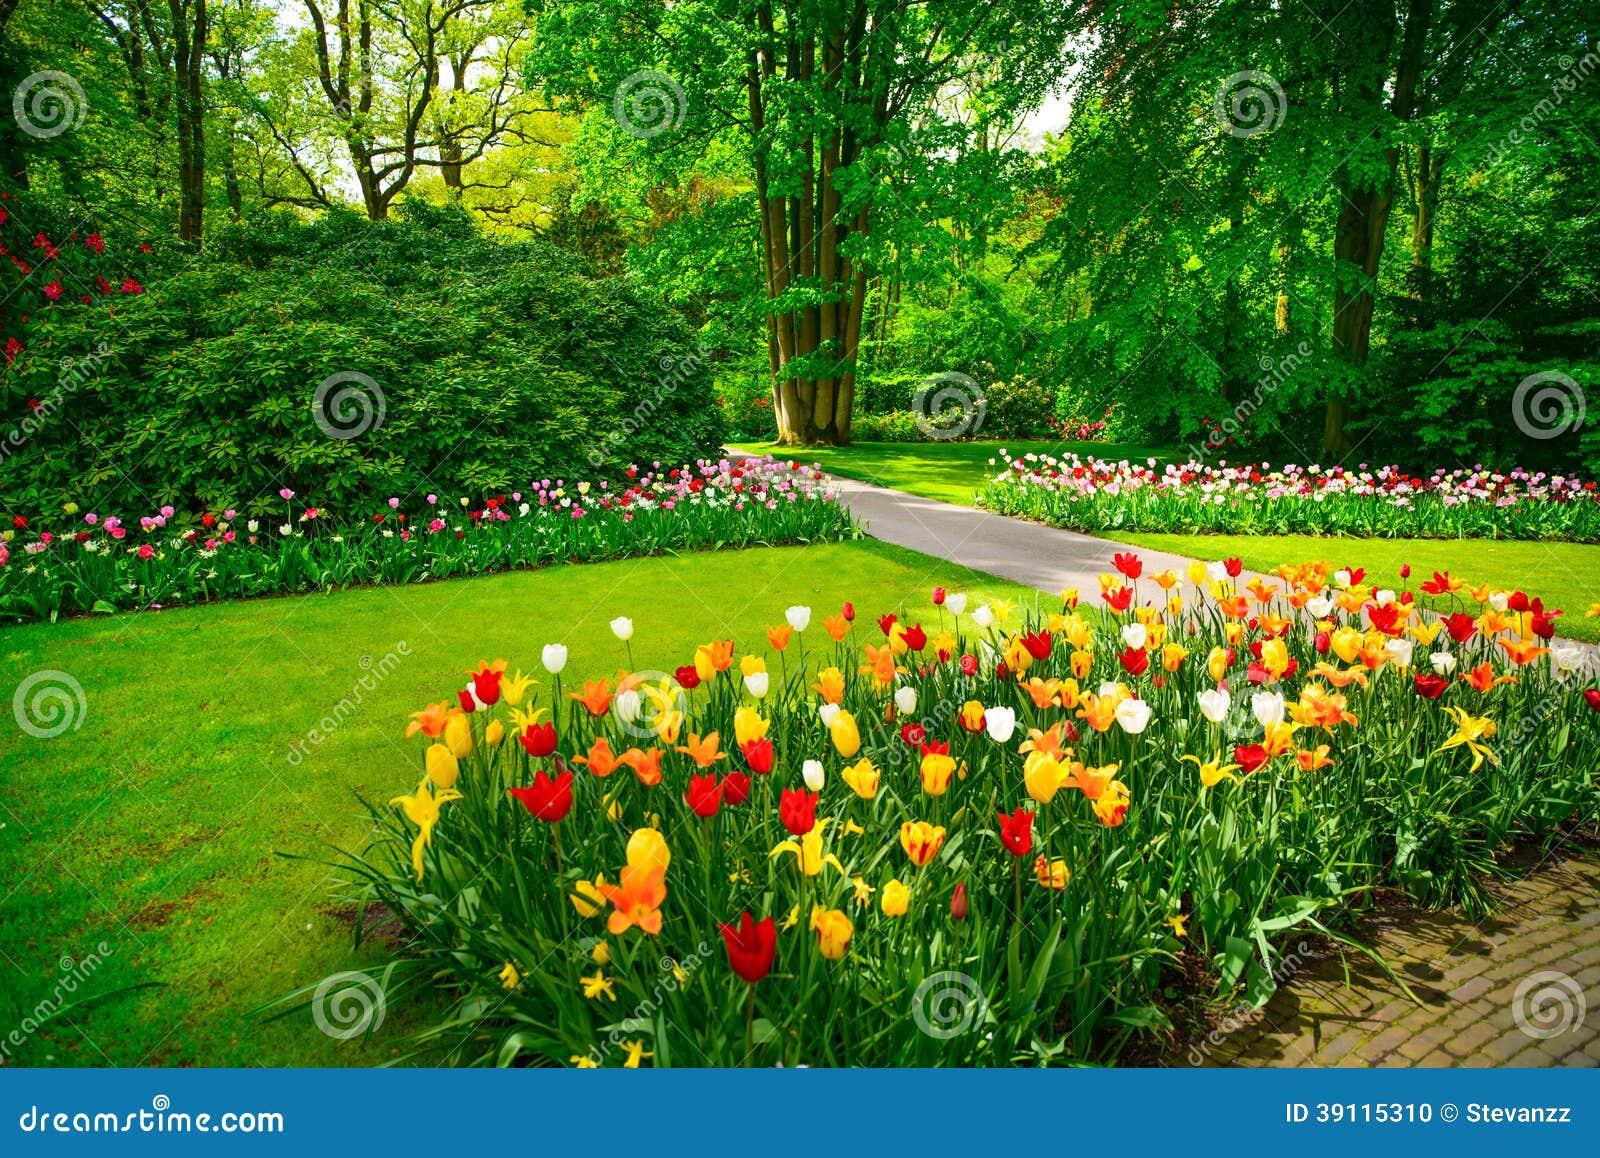 Giardino in Keukenhof, fiori del tulipano. I Paesi Bassi